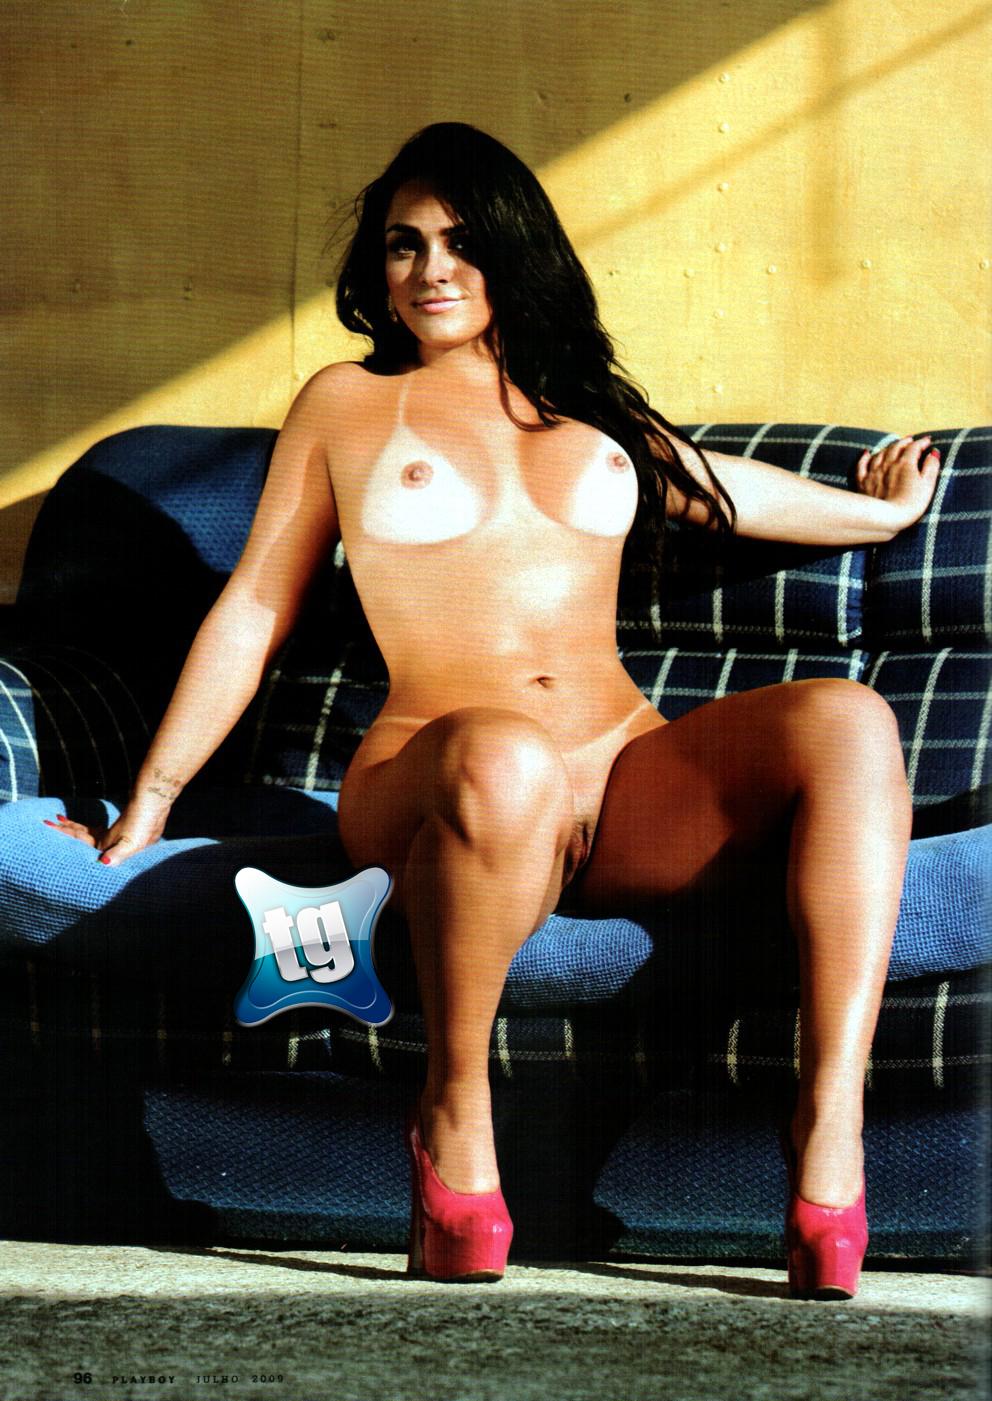 Revista sexy andressa soares a mulher melancia - 3 4